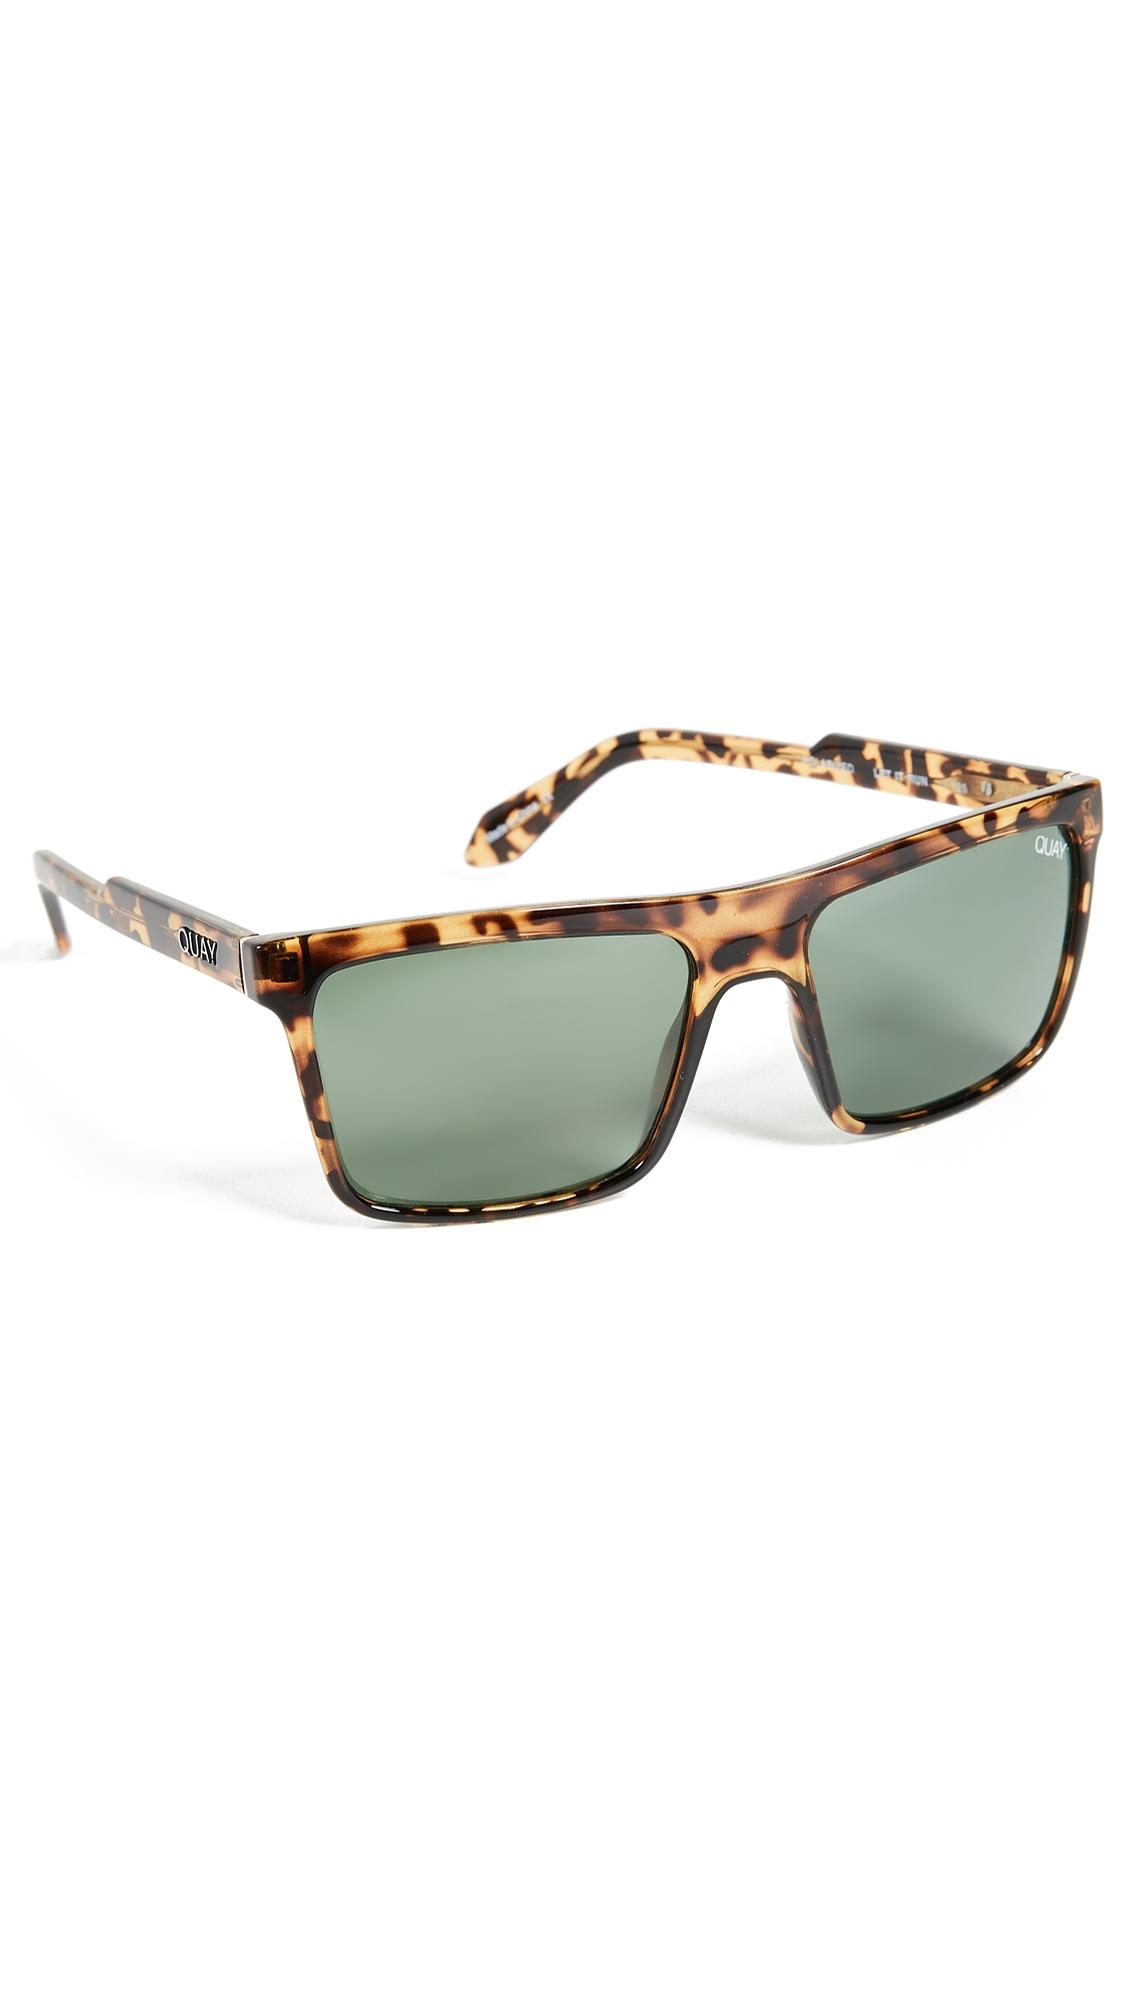 ac5d0f3eba Quay Let It Run Sunglasses In Tortoise Green